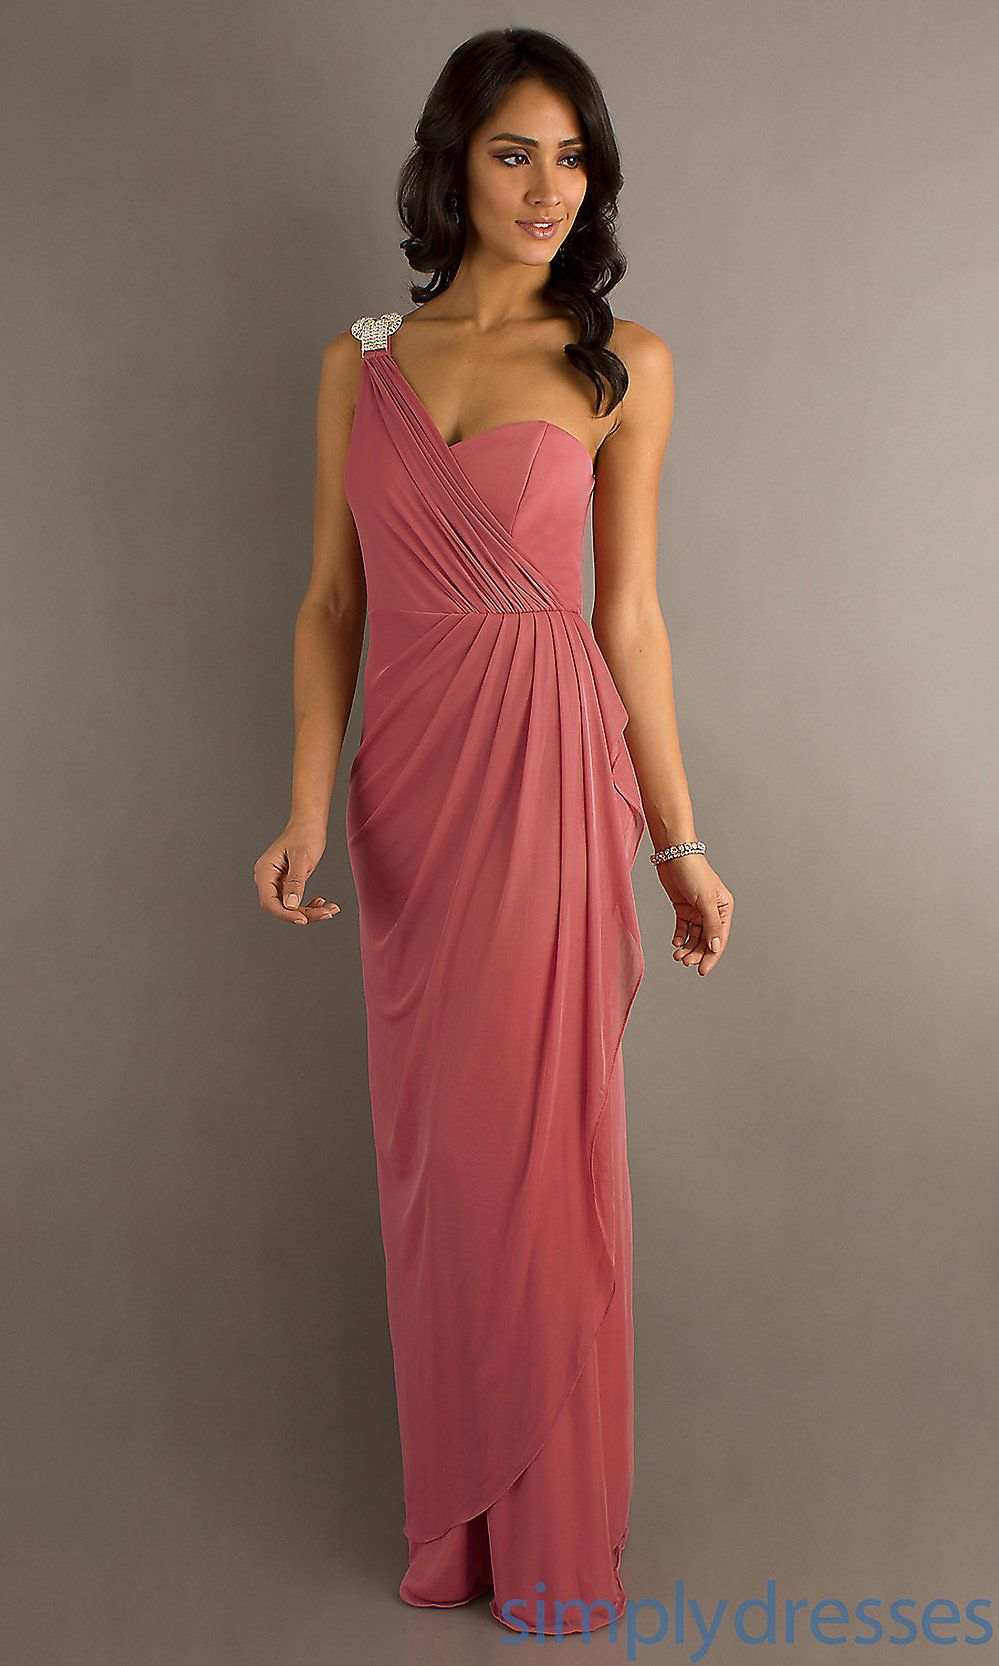 Long one shoulder dress budget long prom dress simply dresses